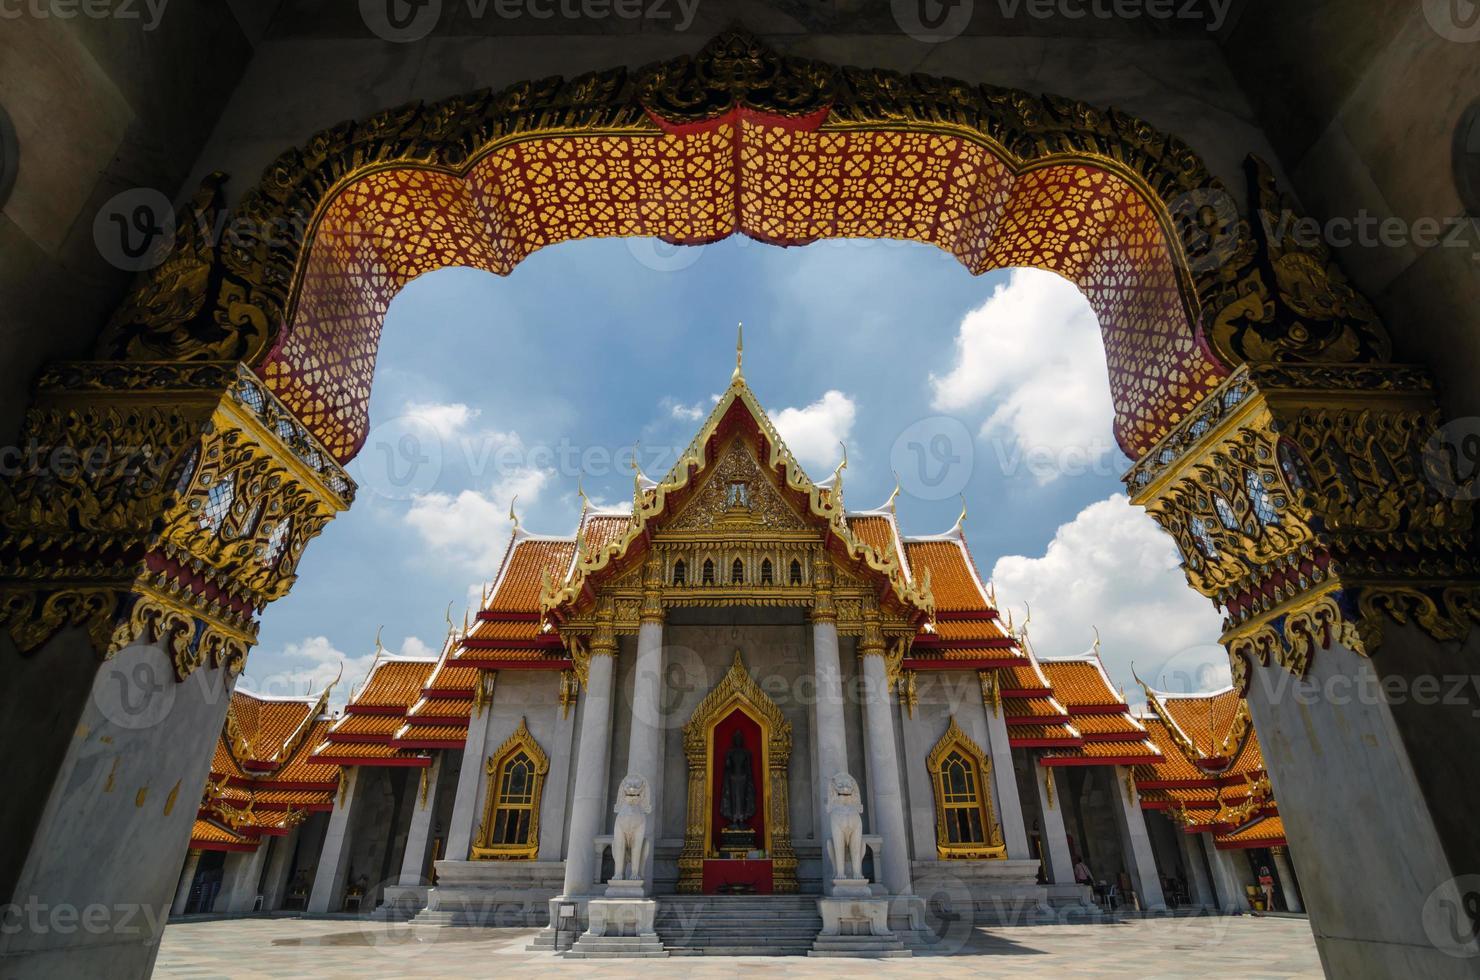 Wat Benjamabophit-The Marble Temple in Bangkok, Thailand photo